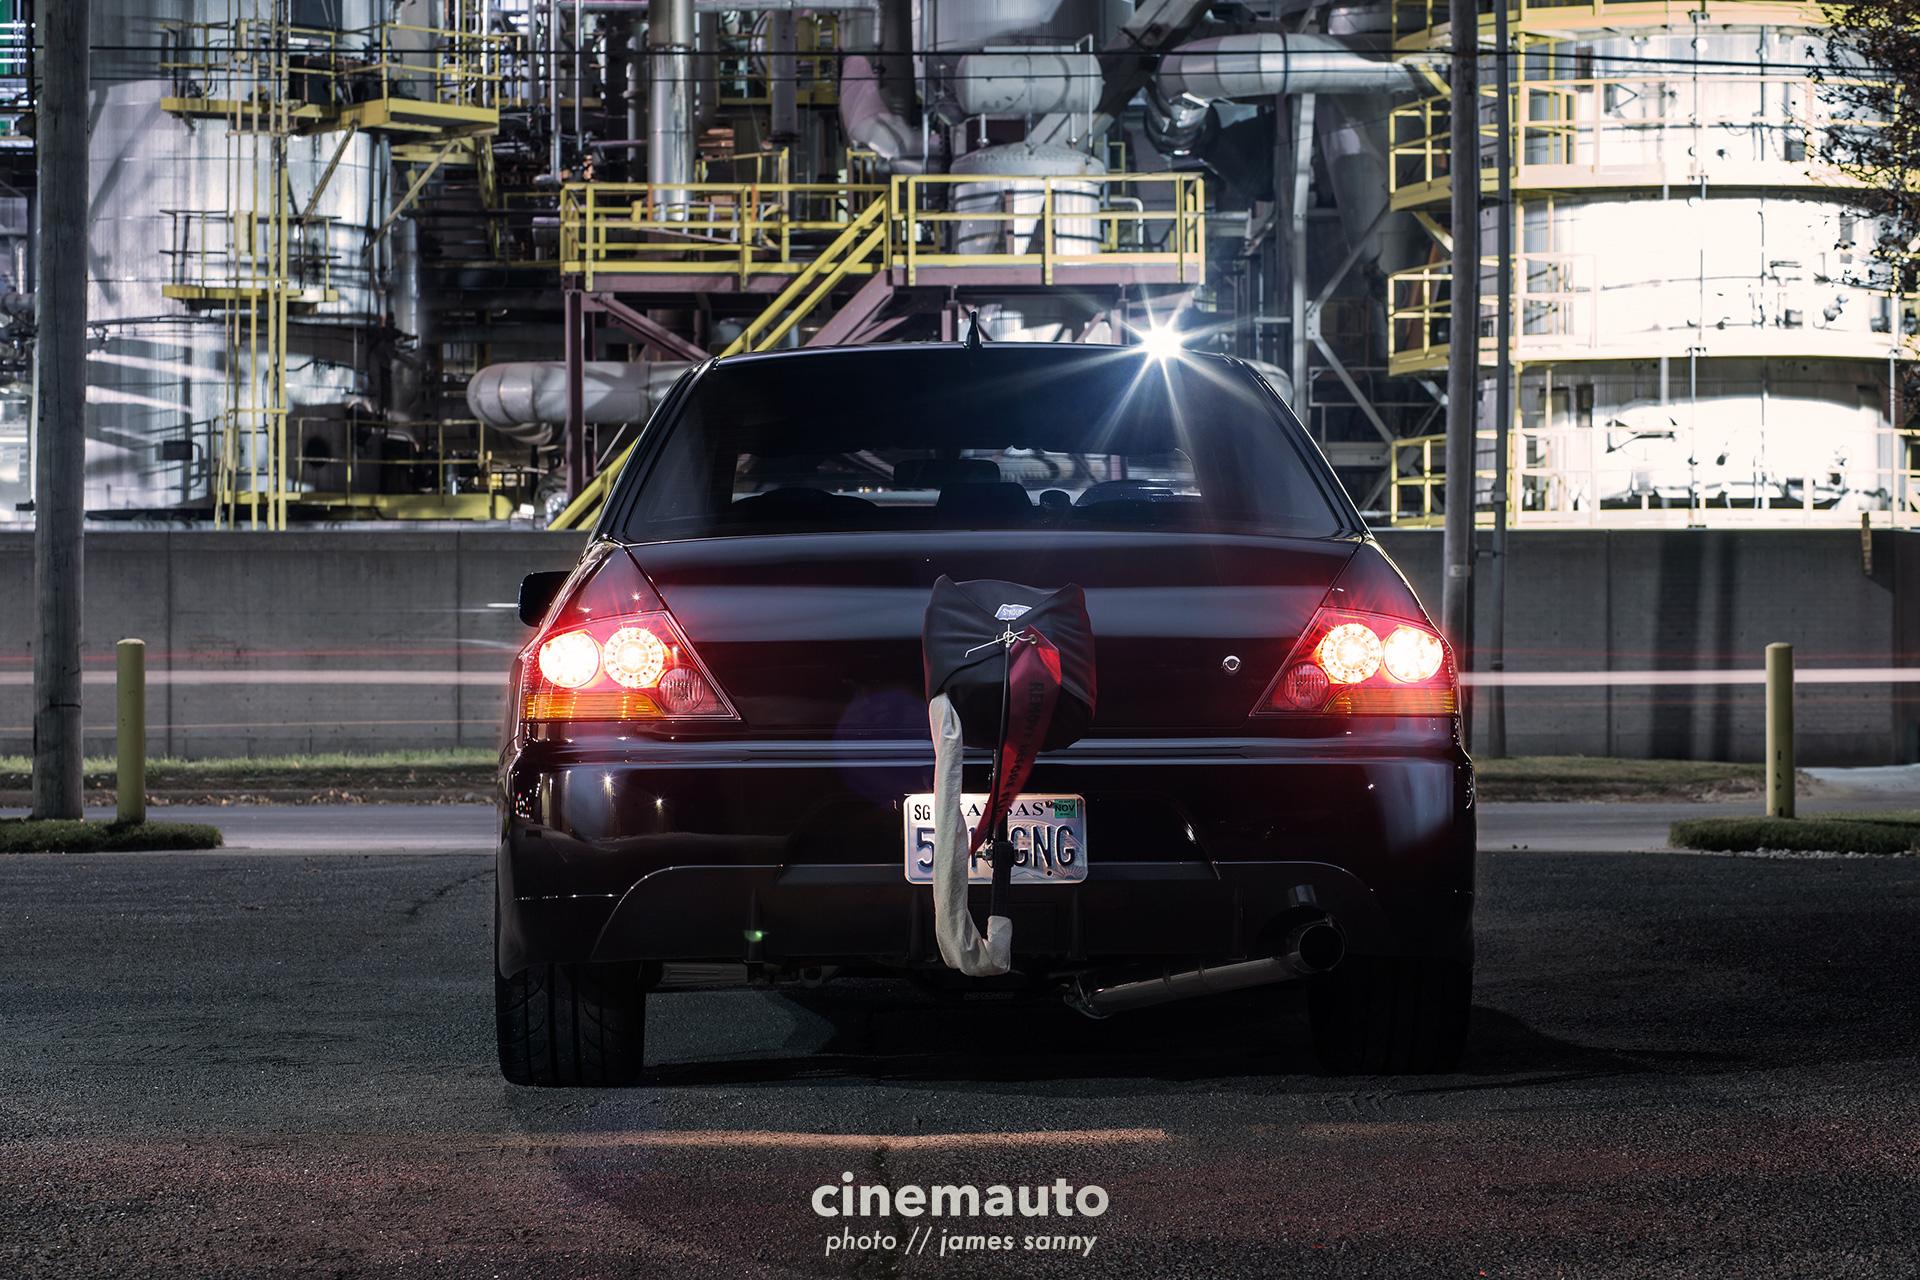 wichita-automotive-photographer-cinemauto-james-sanny-tj11sm.jpg